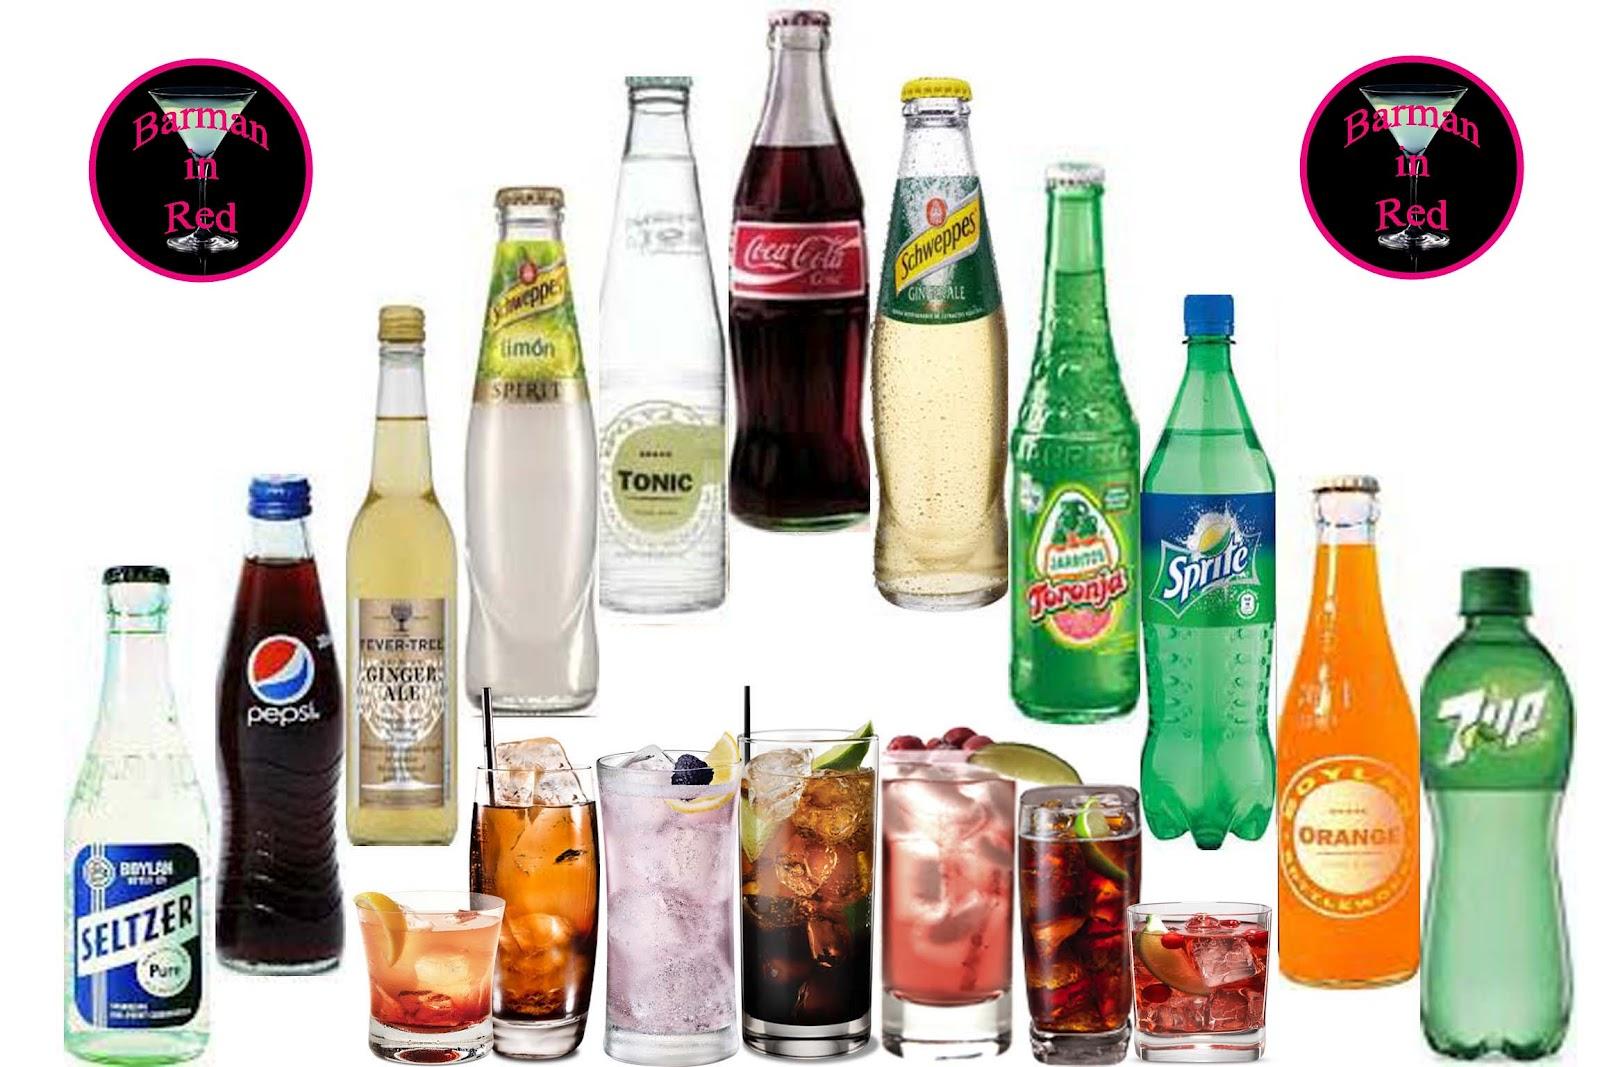 Las bebidas azucaradas nos envejecen YRHw7ppra0pptffv_rjRuLp2RIVO97waWUJKviYW6g6voQKOB3fapyZHzE285g00FsVy08RWQxlVu-2oAjHVNE-RZt5xWbYQYOgiek_5o3HJmMGSuGqhiWDMlCAPvrh6pQ